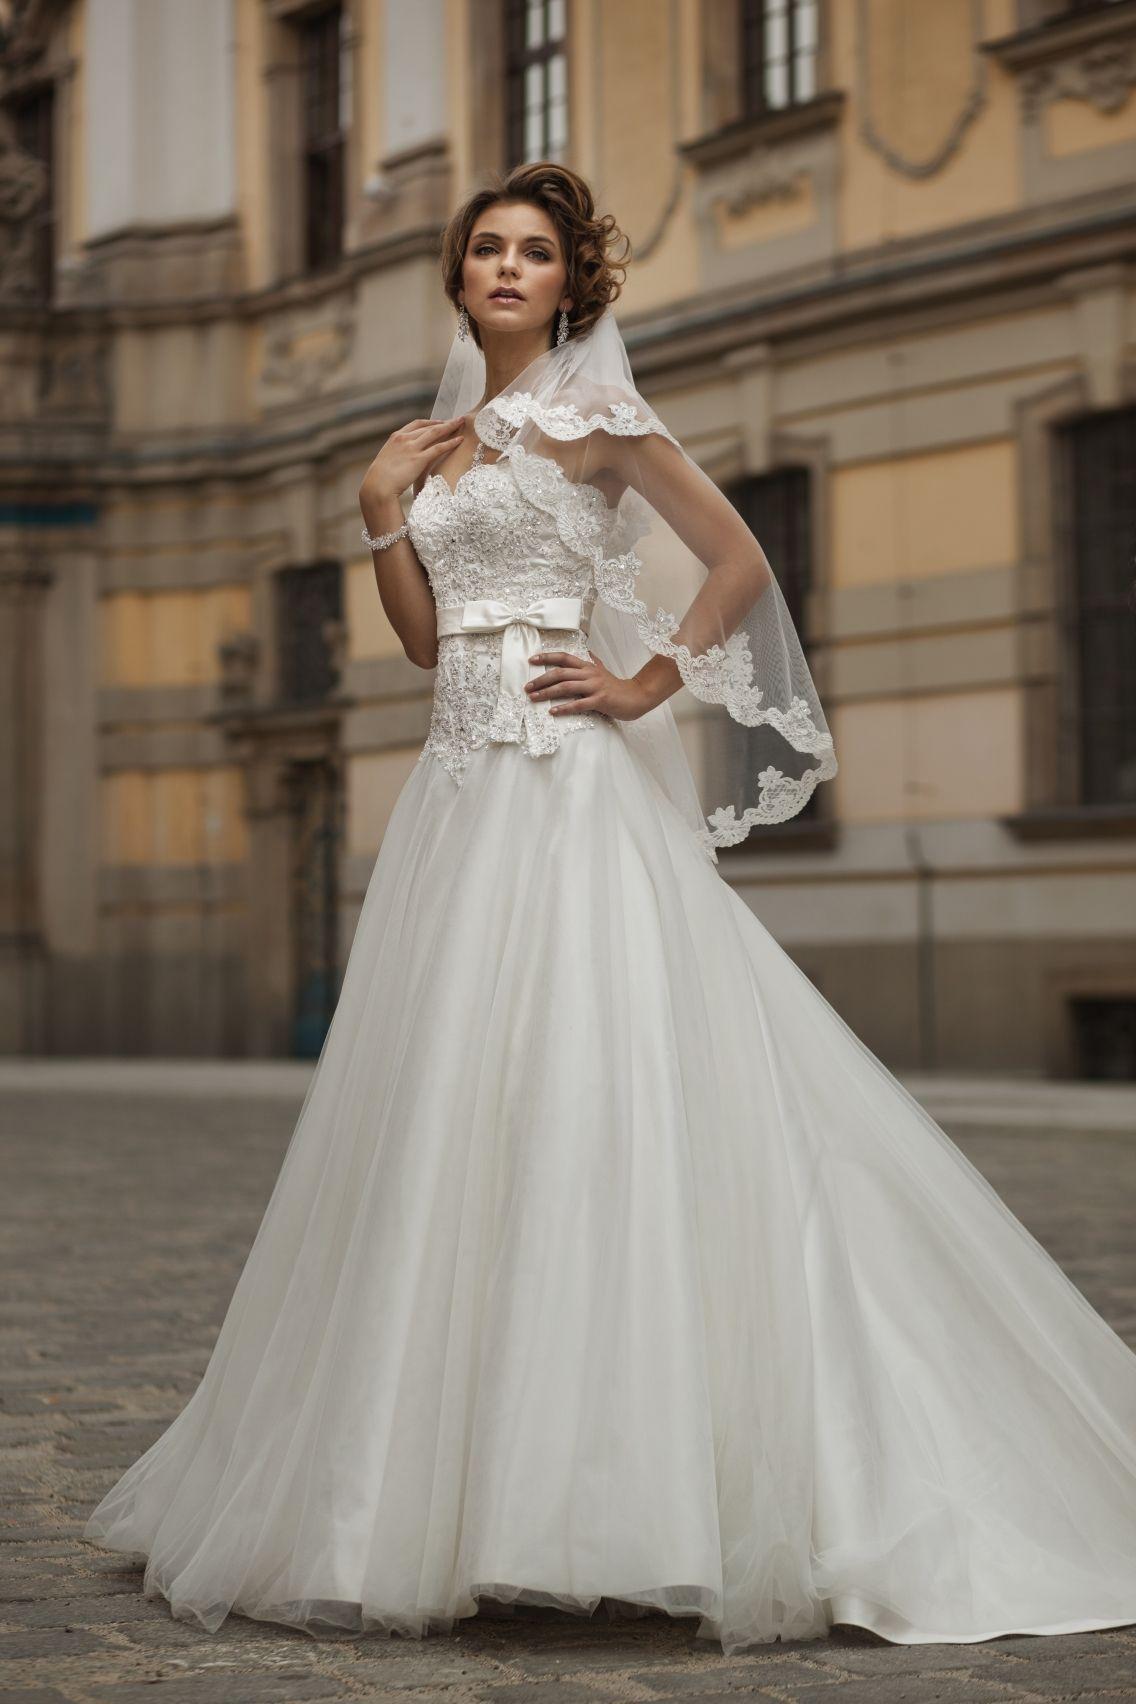 Nanteza Suknie ślubne Sukienki Do ślubu Annais Bridal Suknie